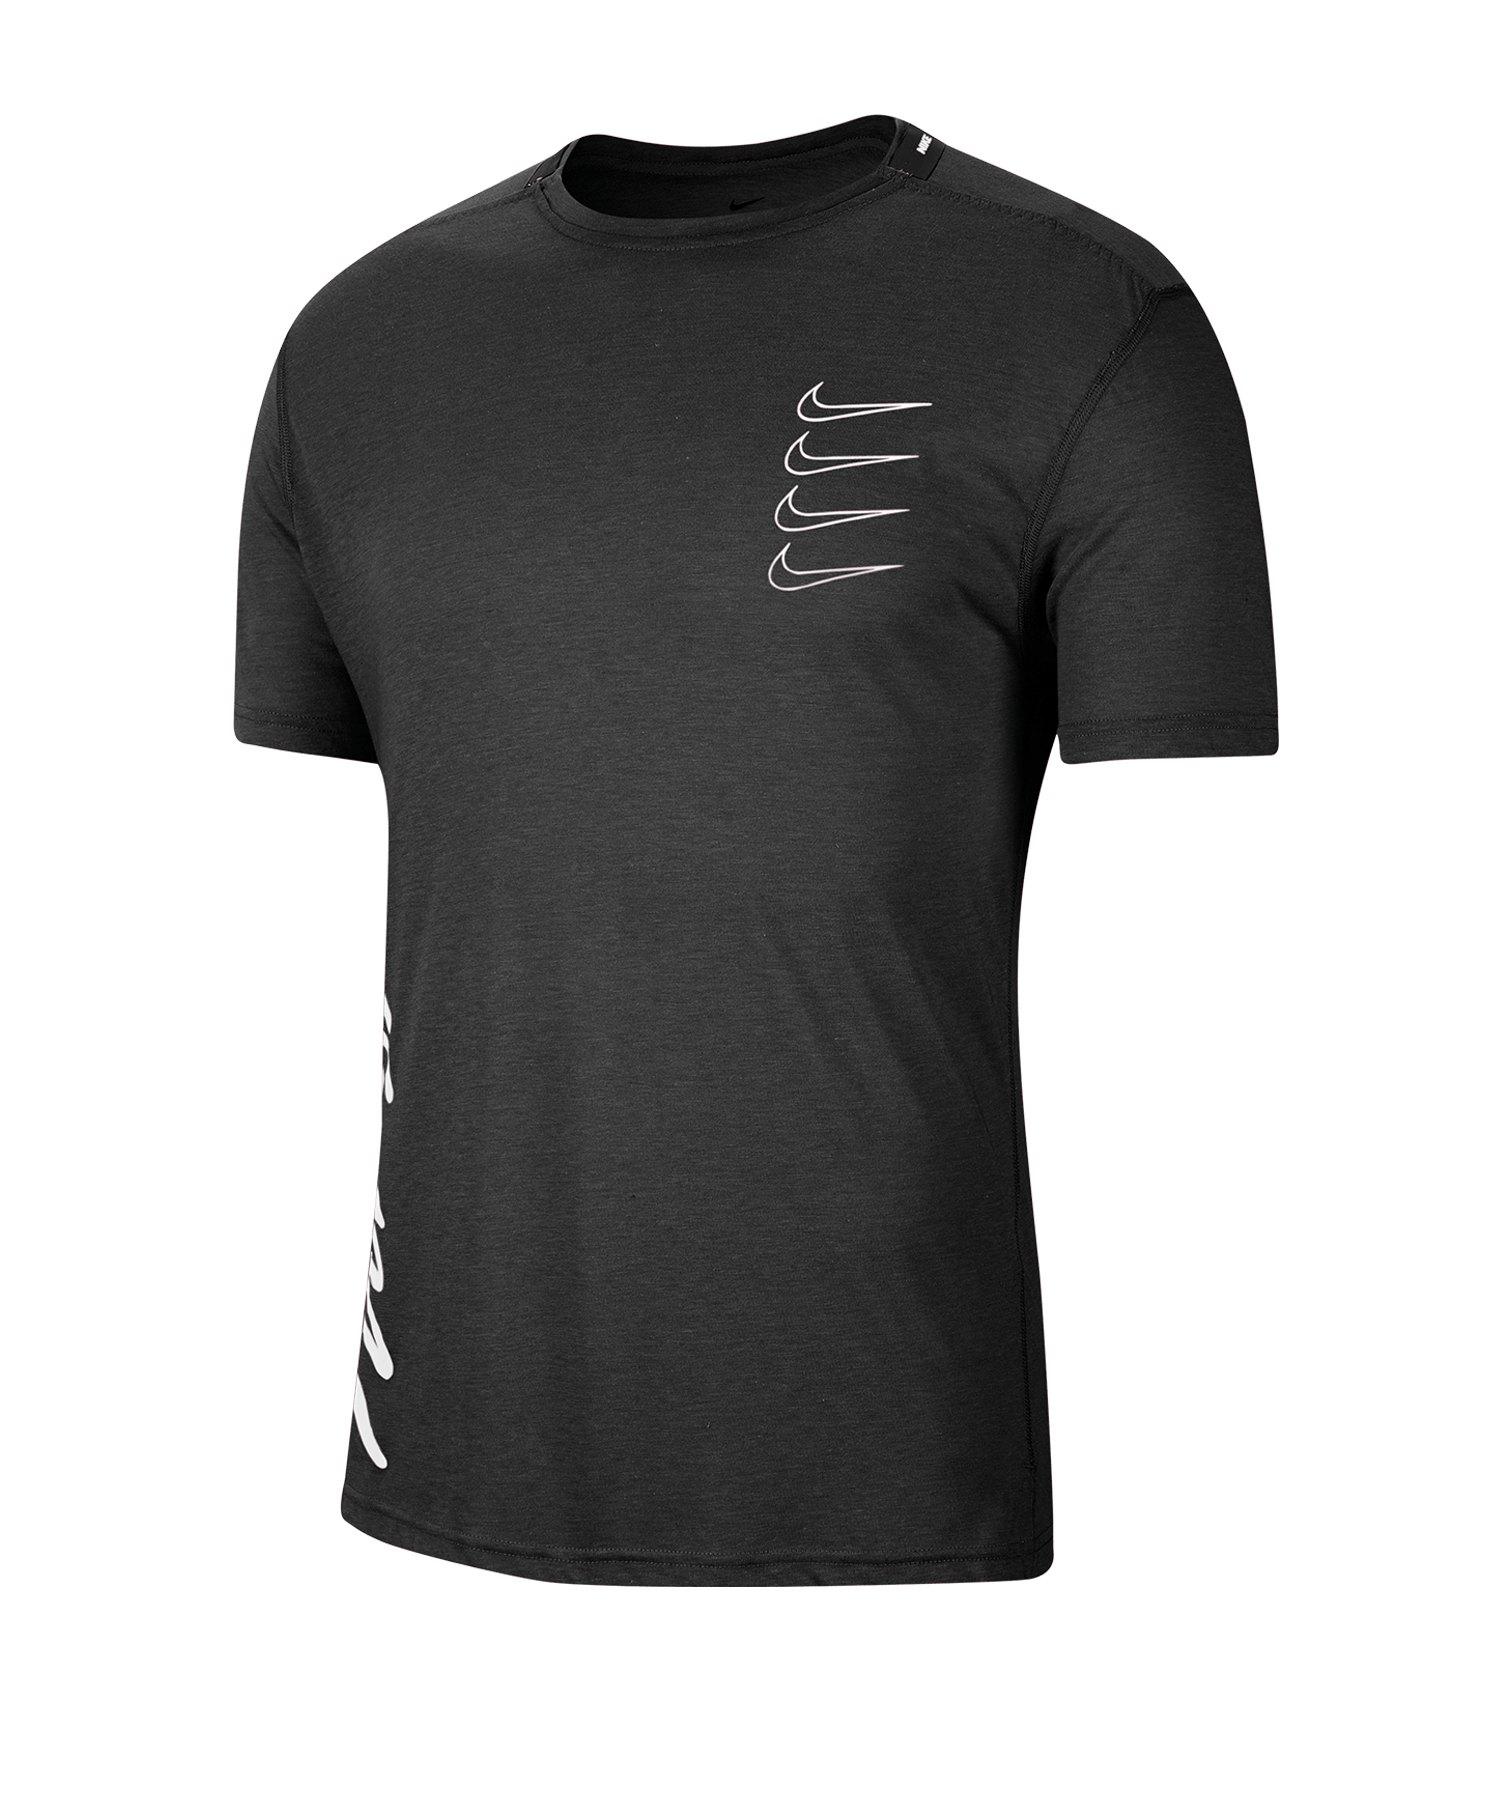 Nike Training T-Shirt Schwarz F010 - schwarz